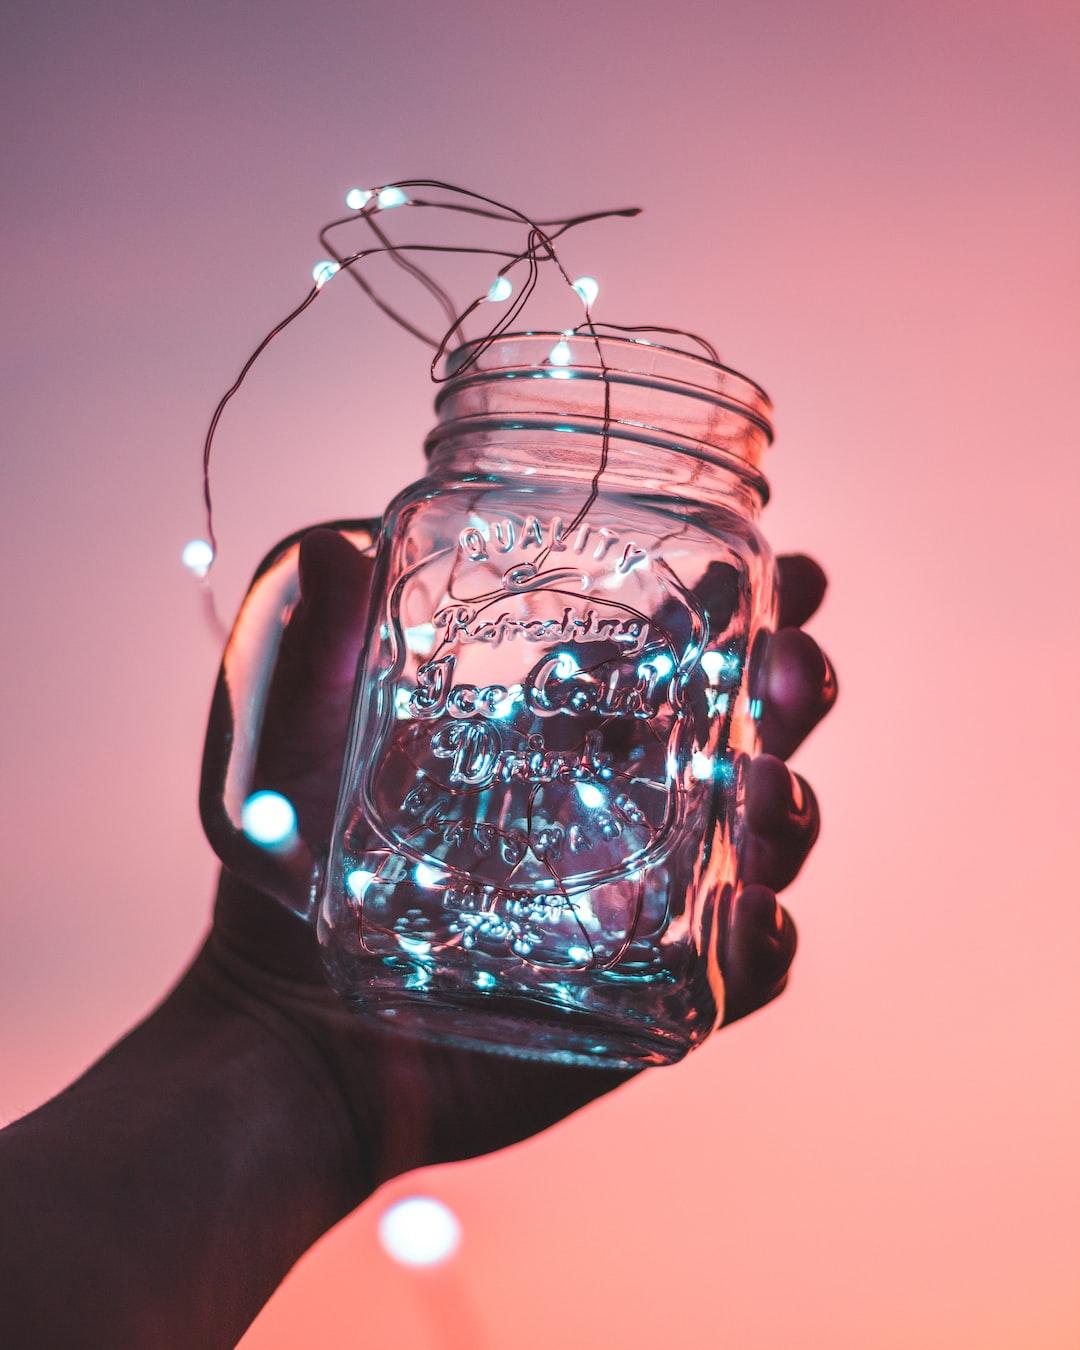 Birthday Photography Lighting: Sunset Jar 2 Photo By Diego PH (@jdiegoph) On Unsplash